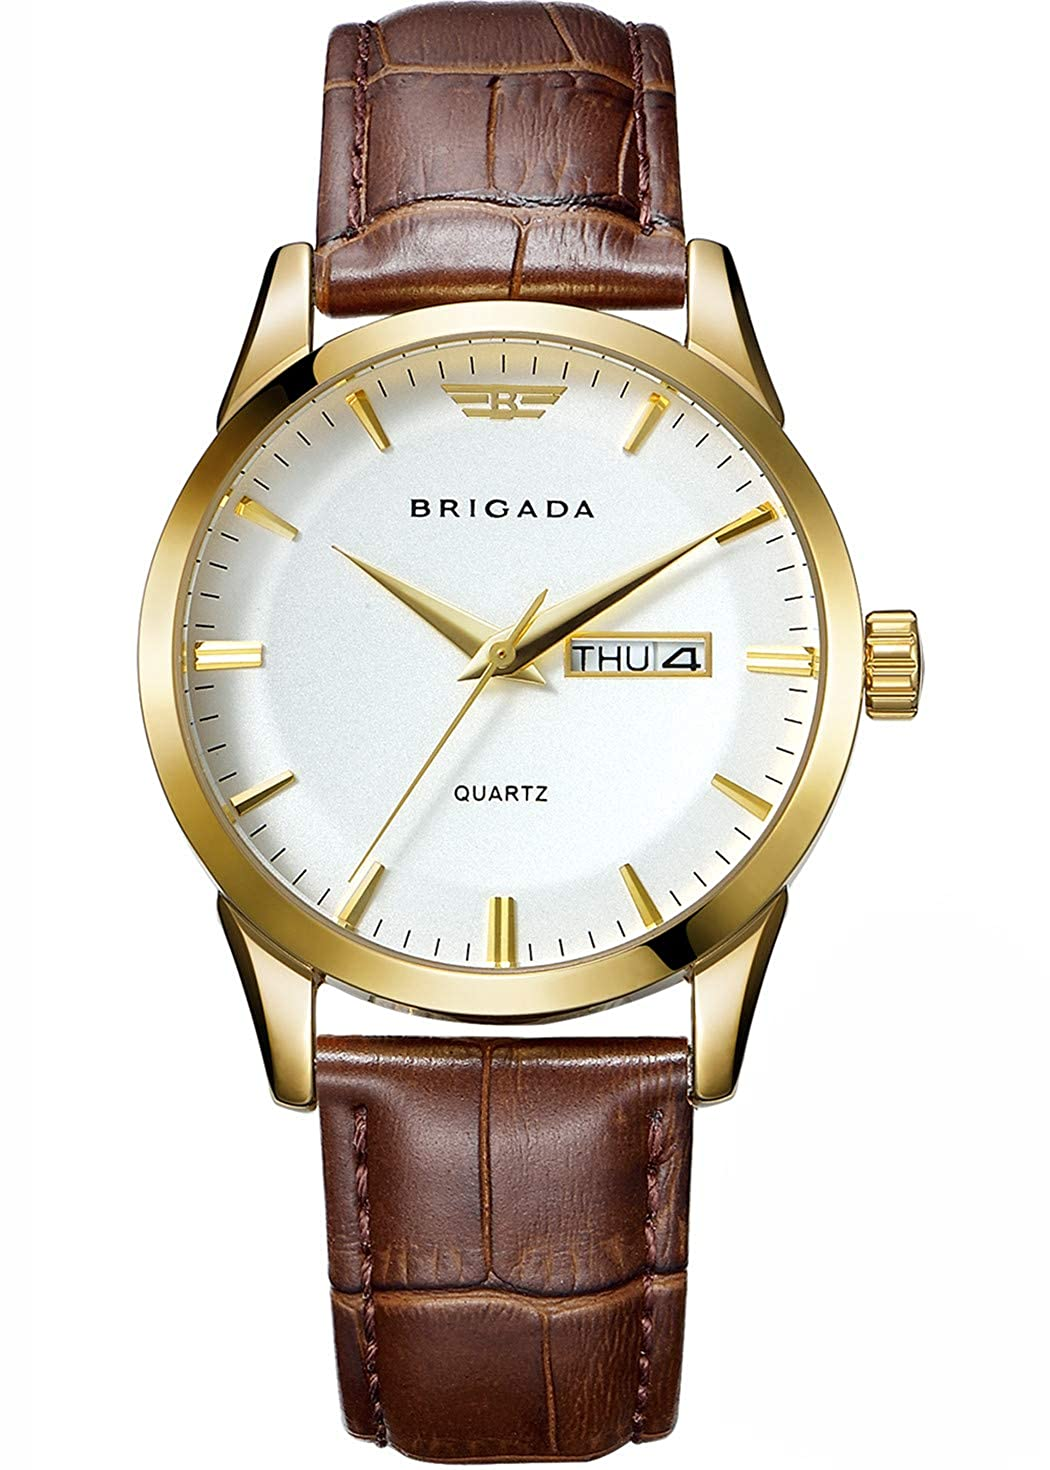 81d220a5a Amazon.com: BRIGADA Swiss Brand Classic Gold Men's Dress Watch for Men with  Date Calendar, Business Casual Quartz Men's Watch Waterproof: BRIGADA:  Watches